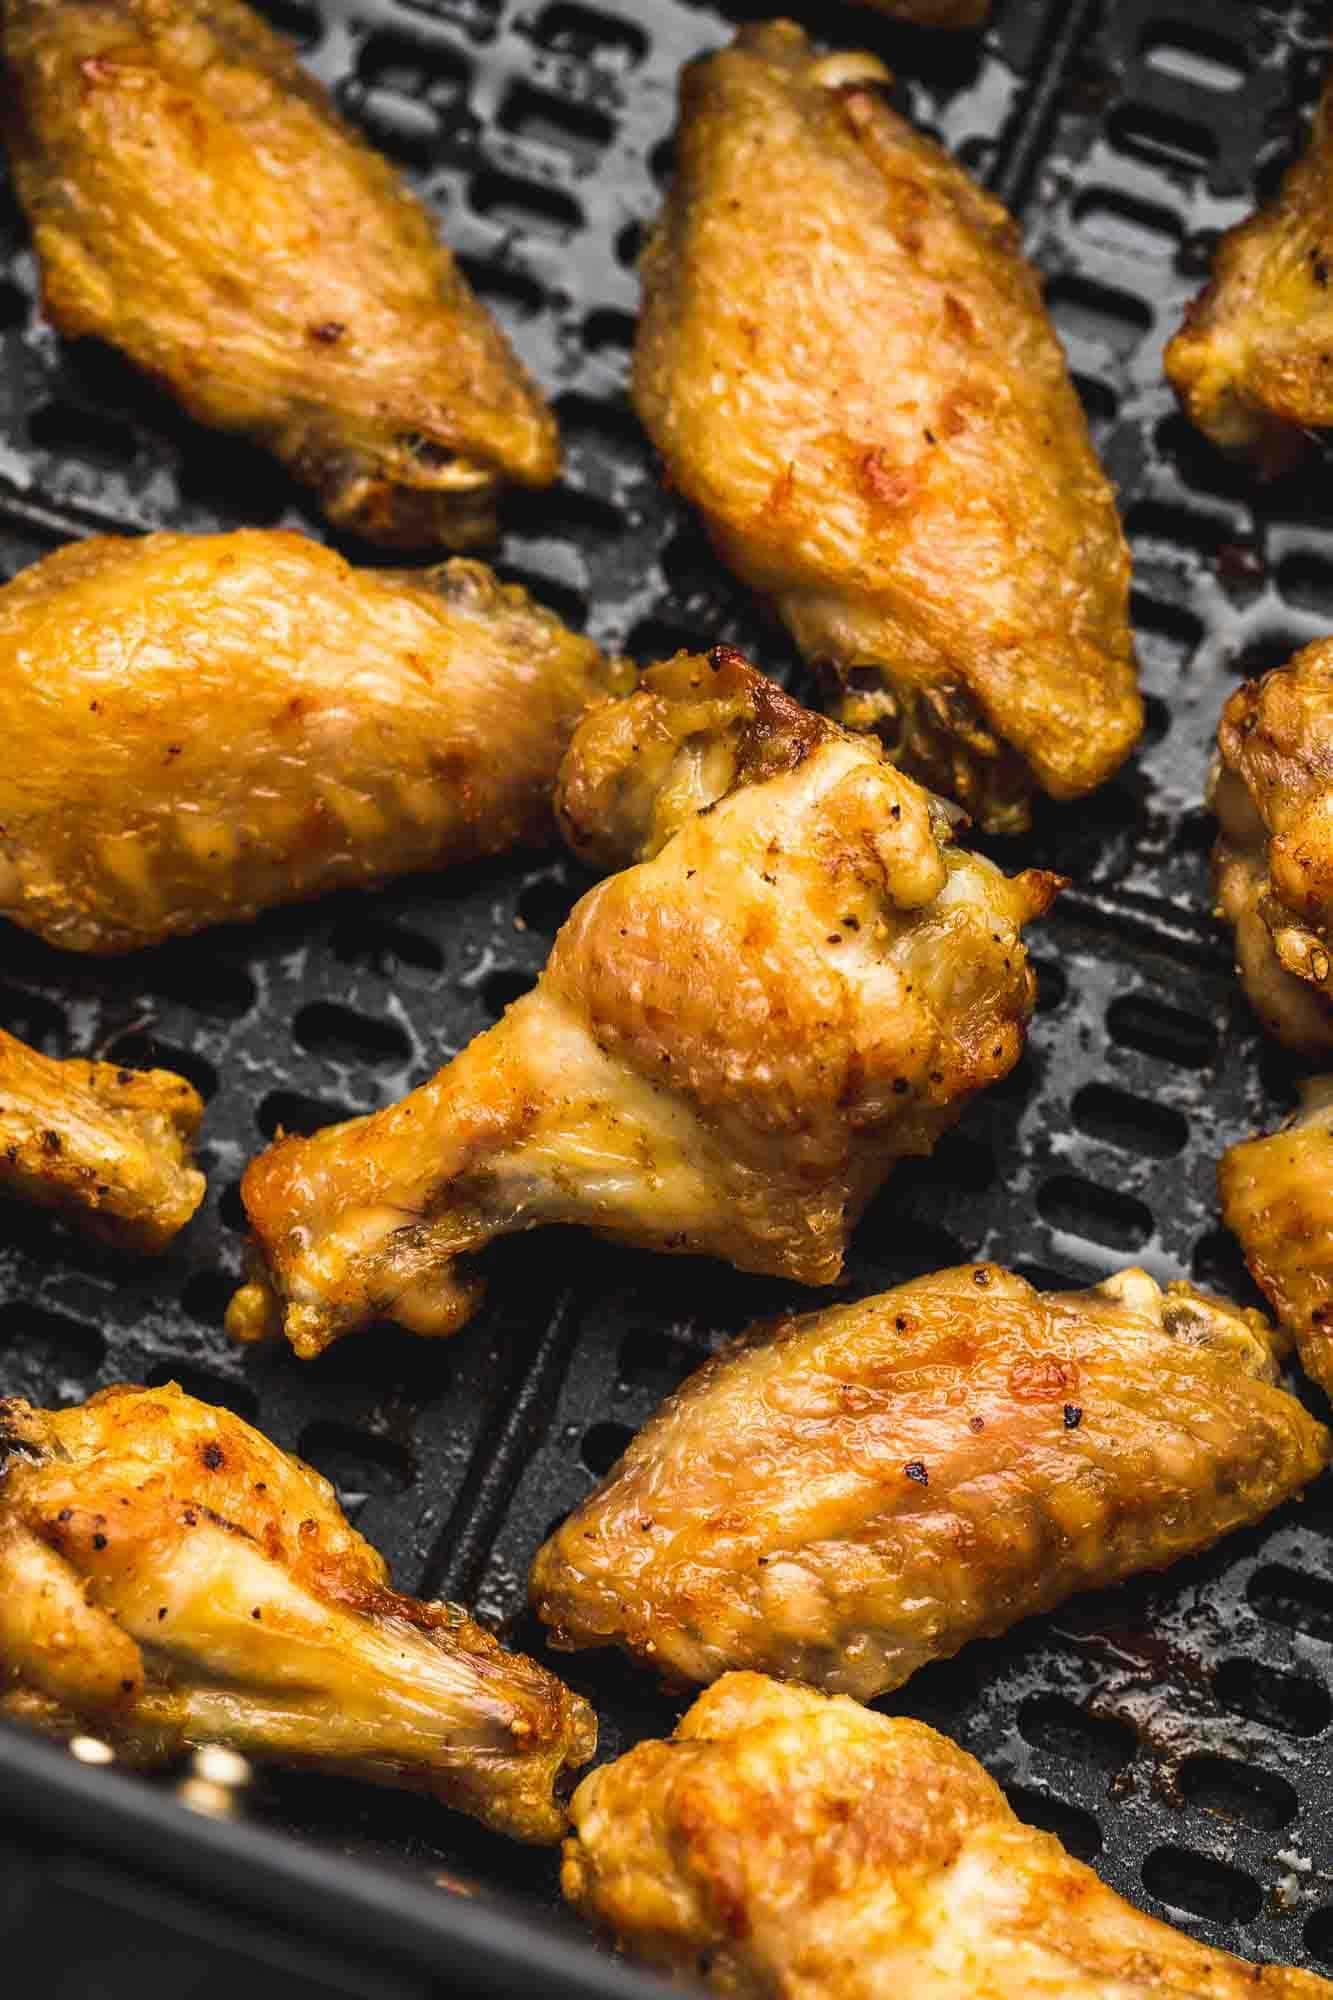 Crispy chicken wings in the Air Fryer basket